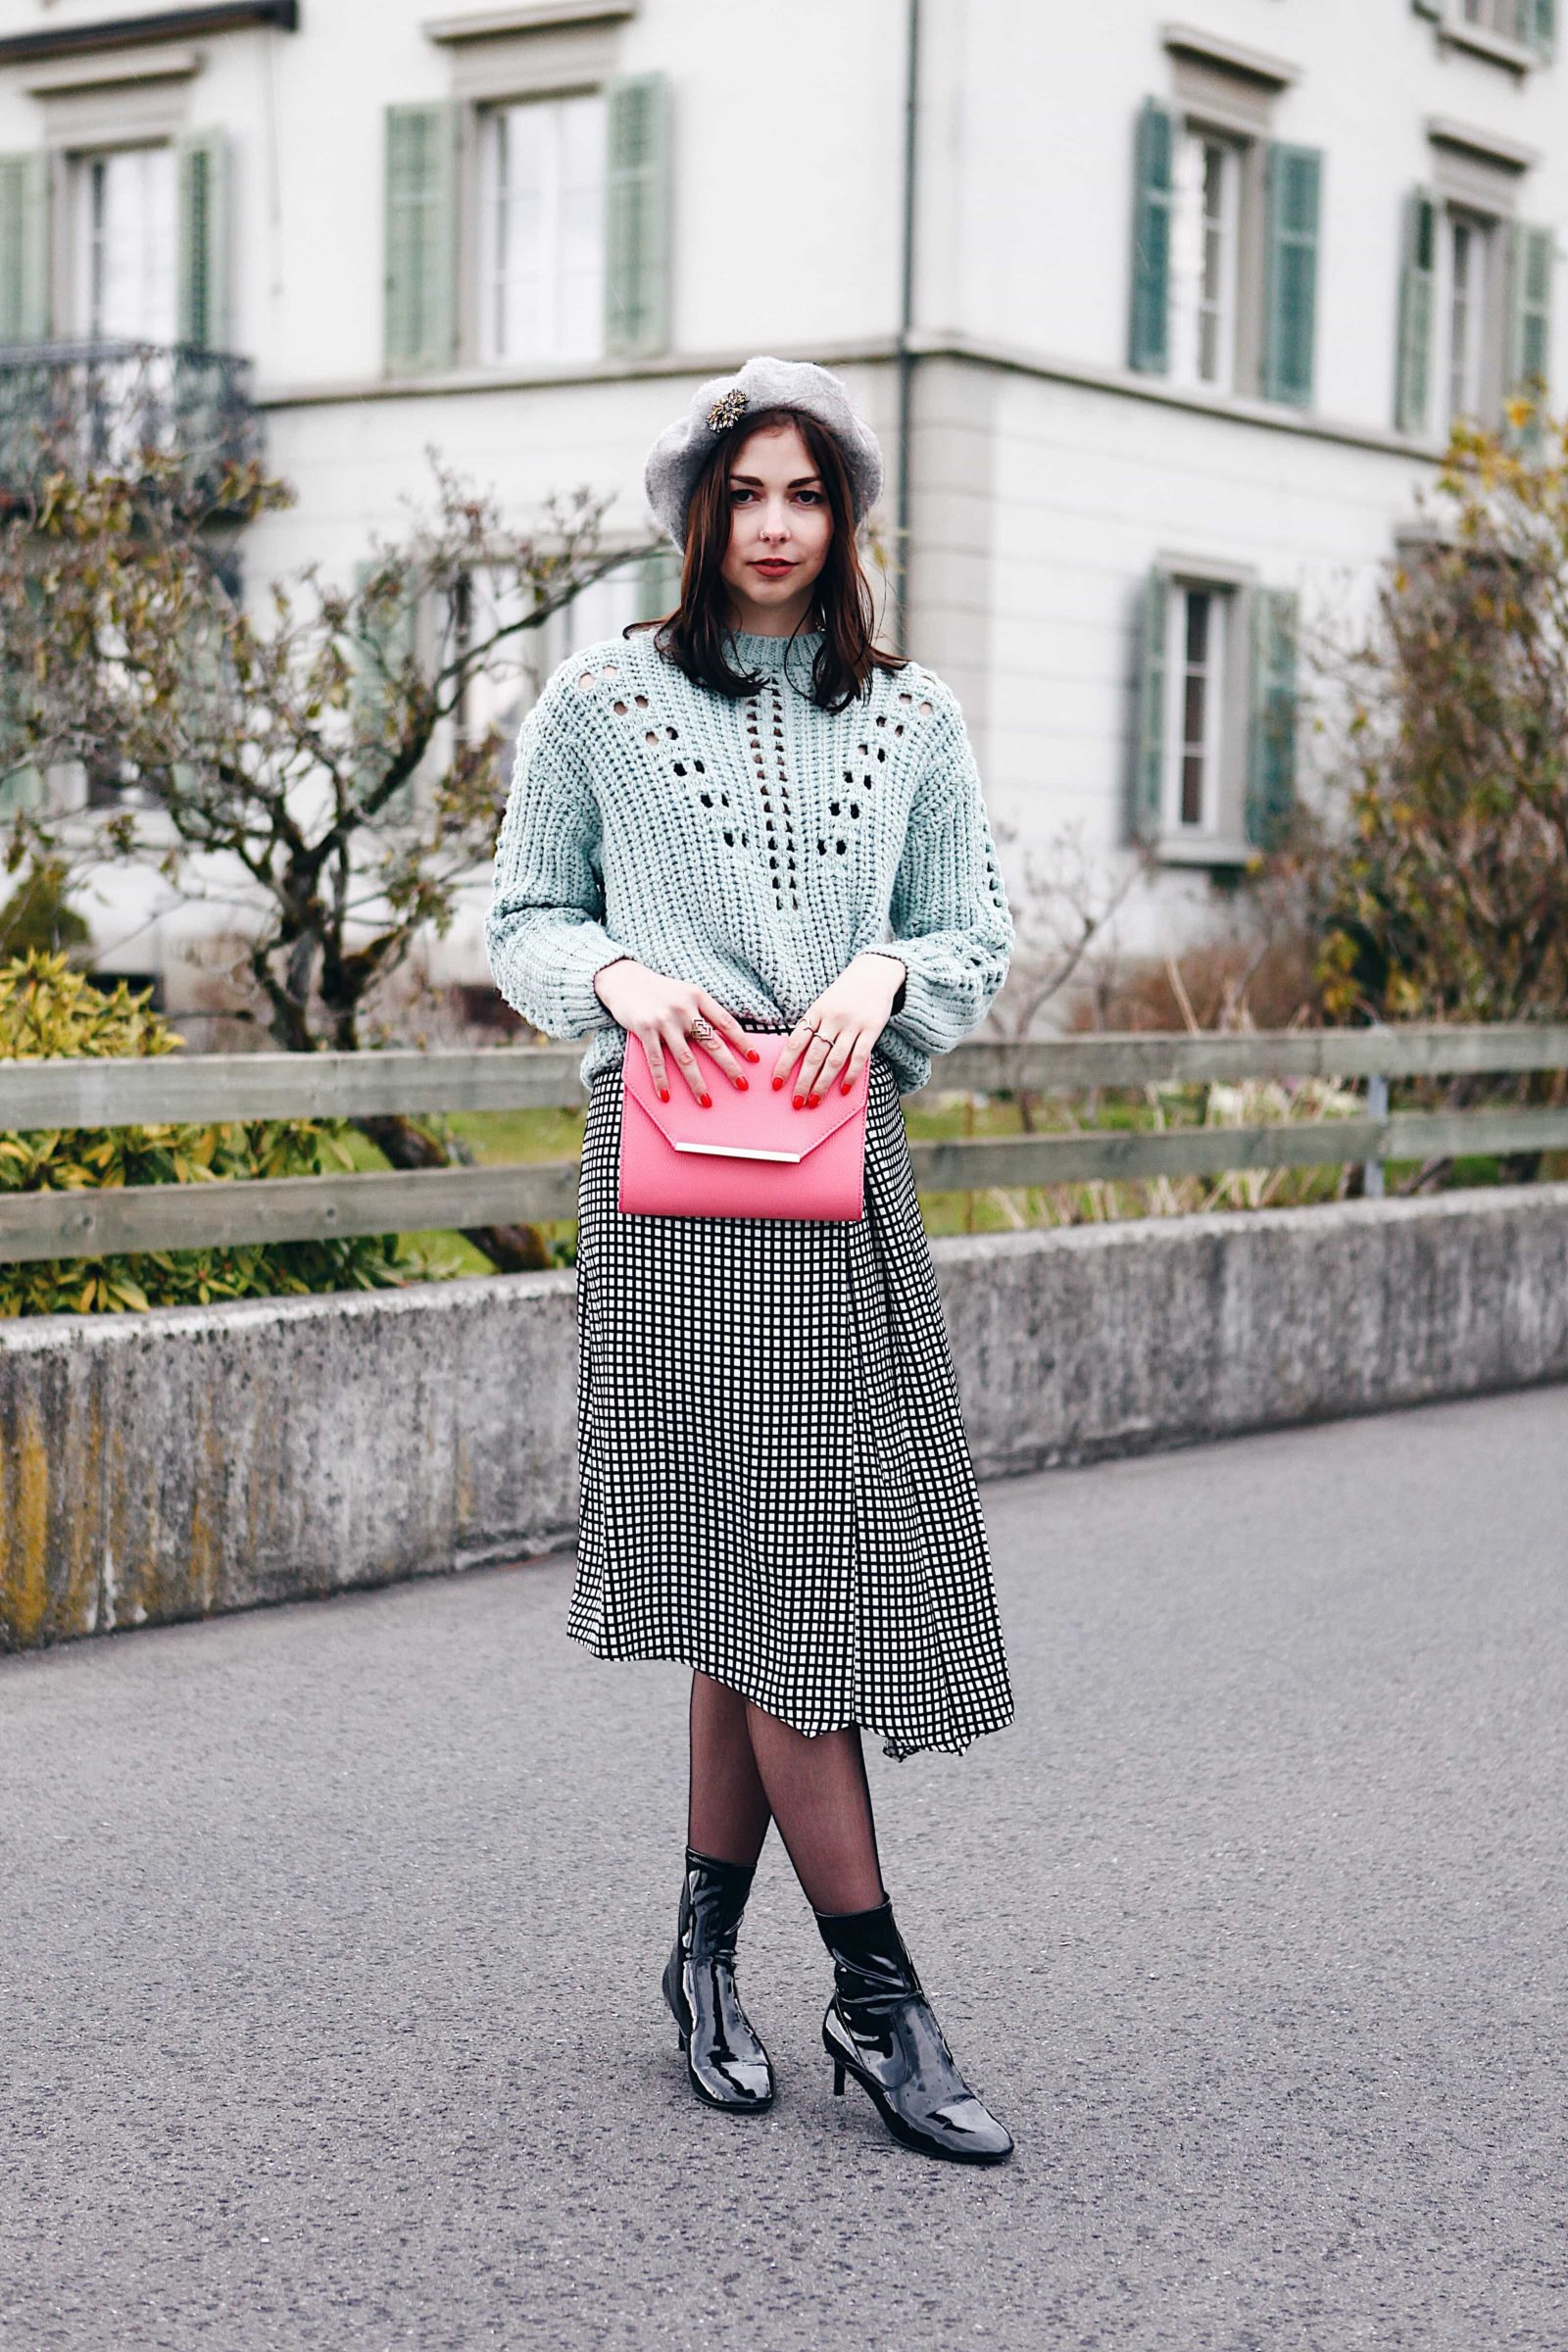 Swiss Fashion Blogger Swenja Willms